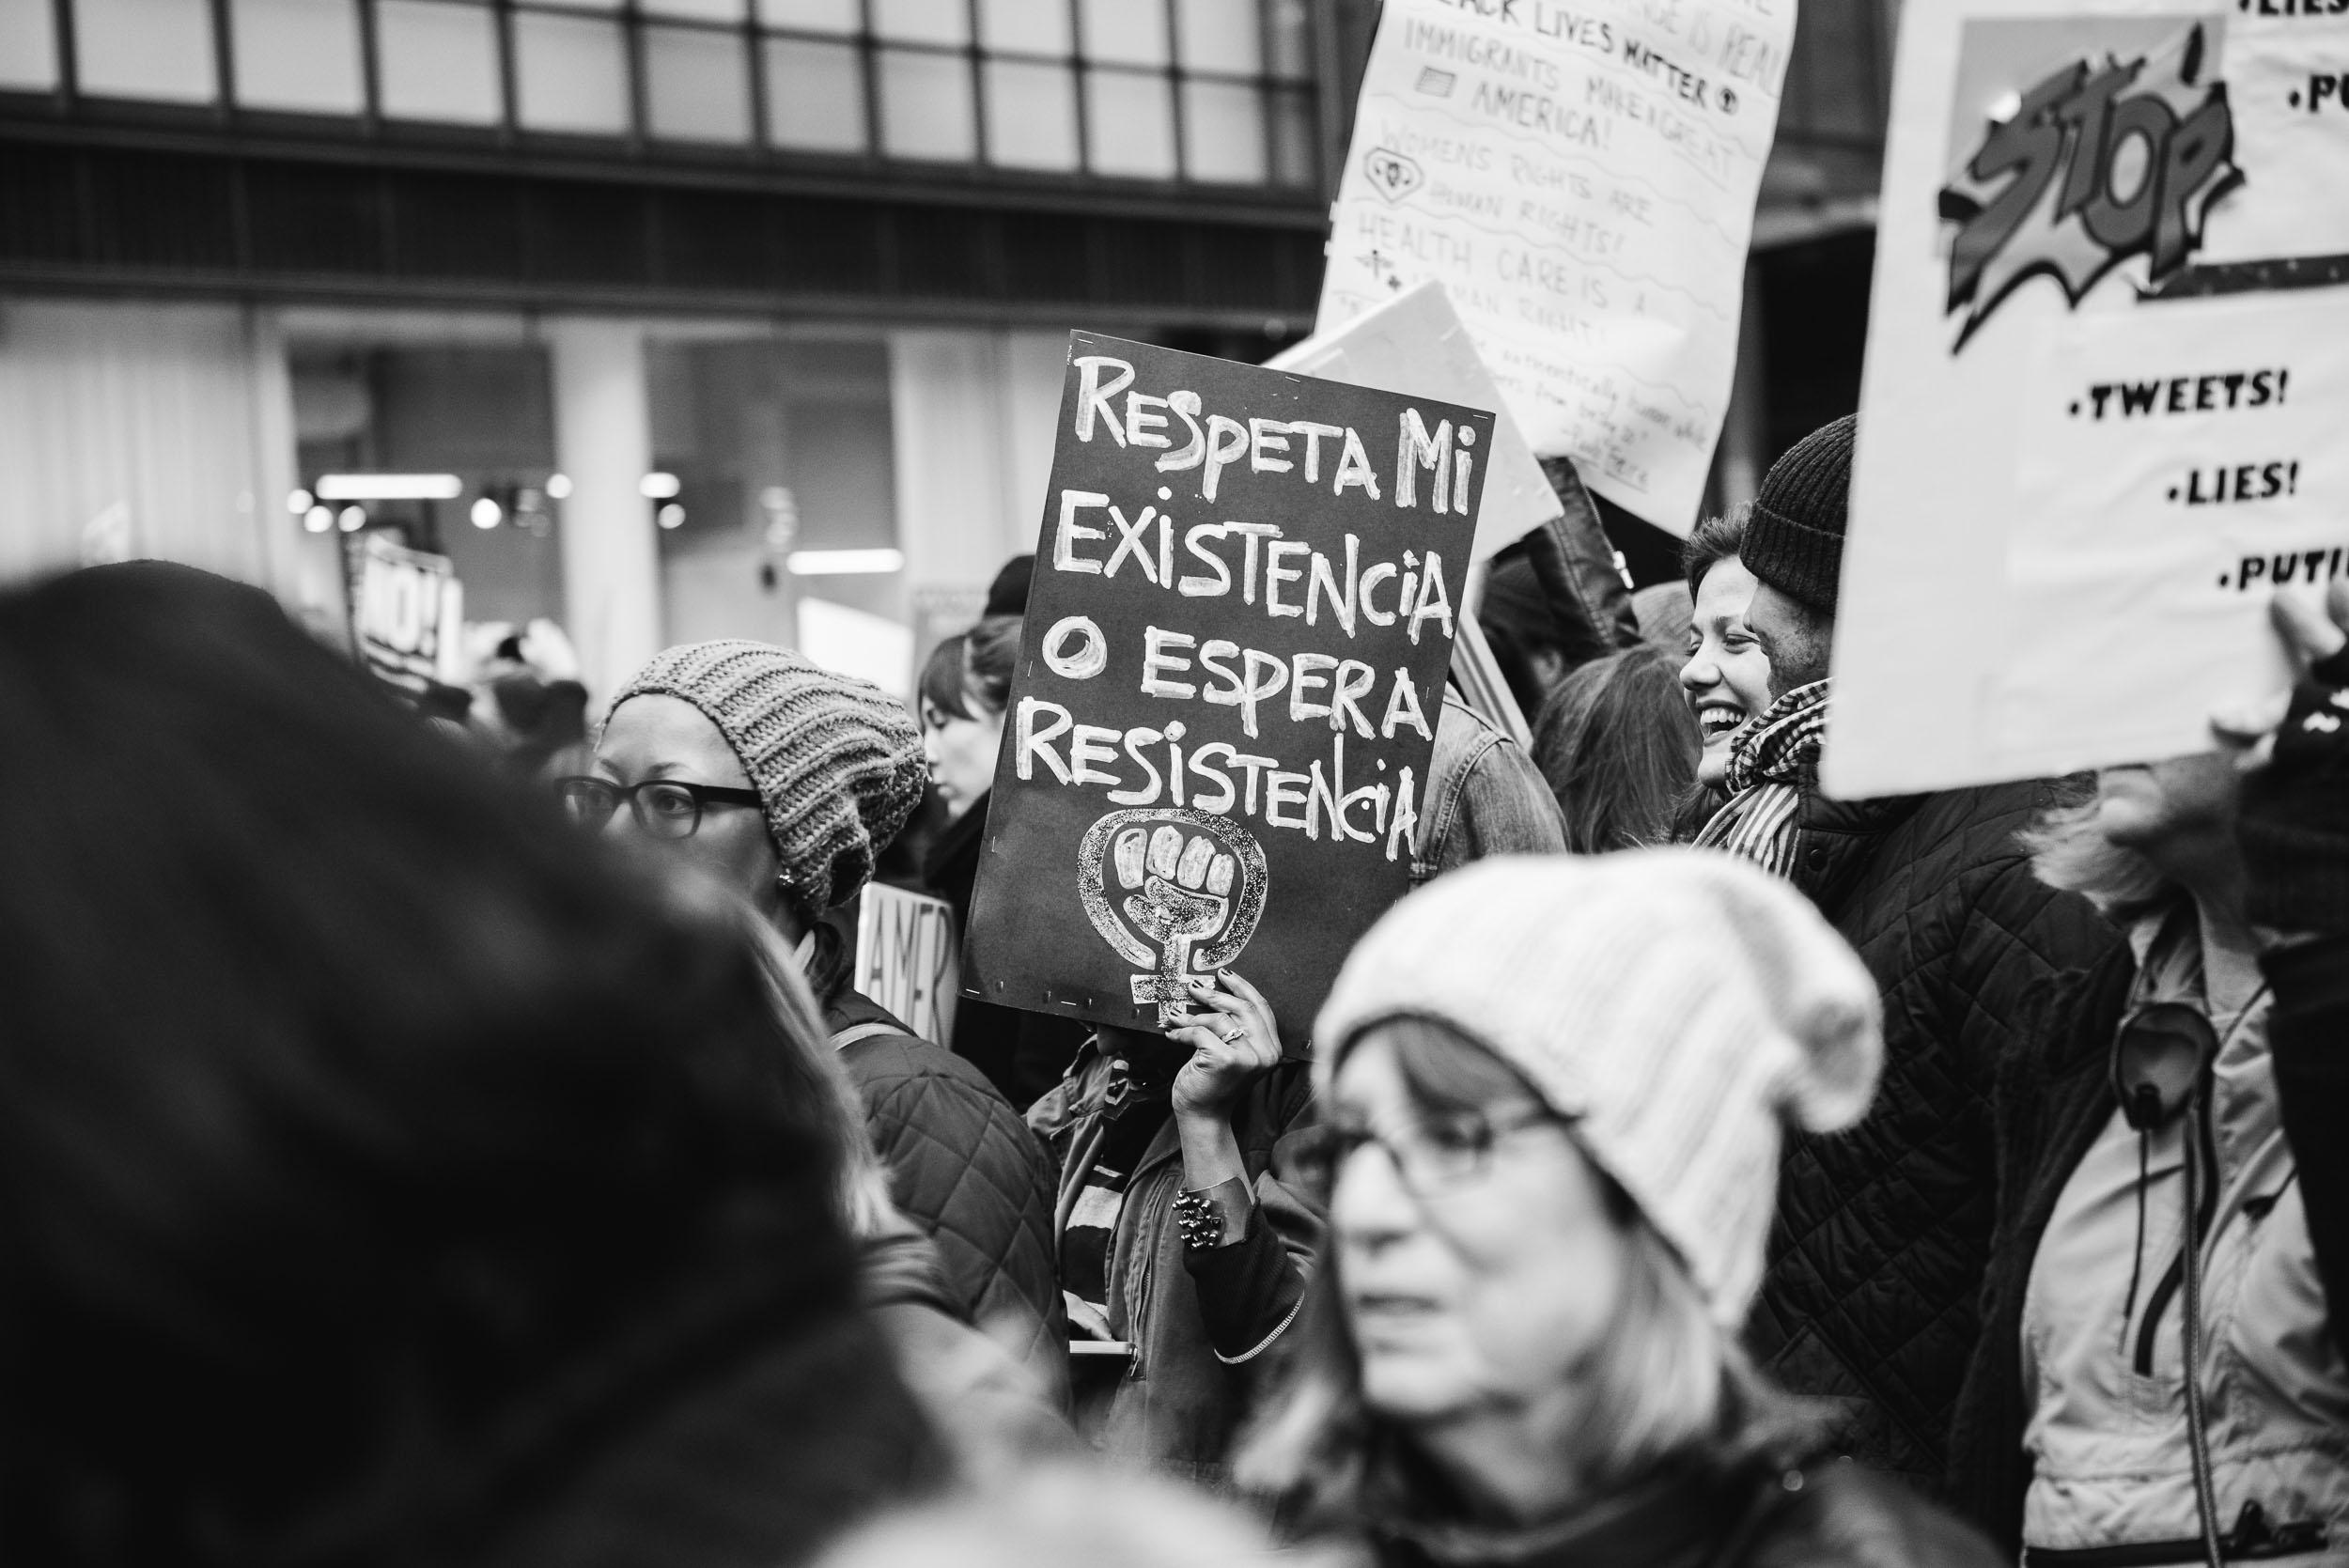 20170121 - NYC Women's March-5.jpg